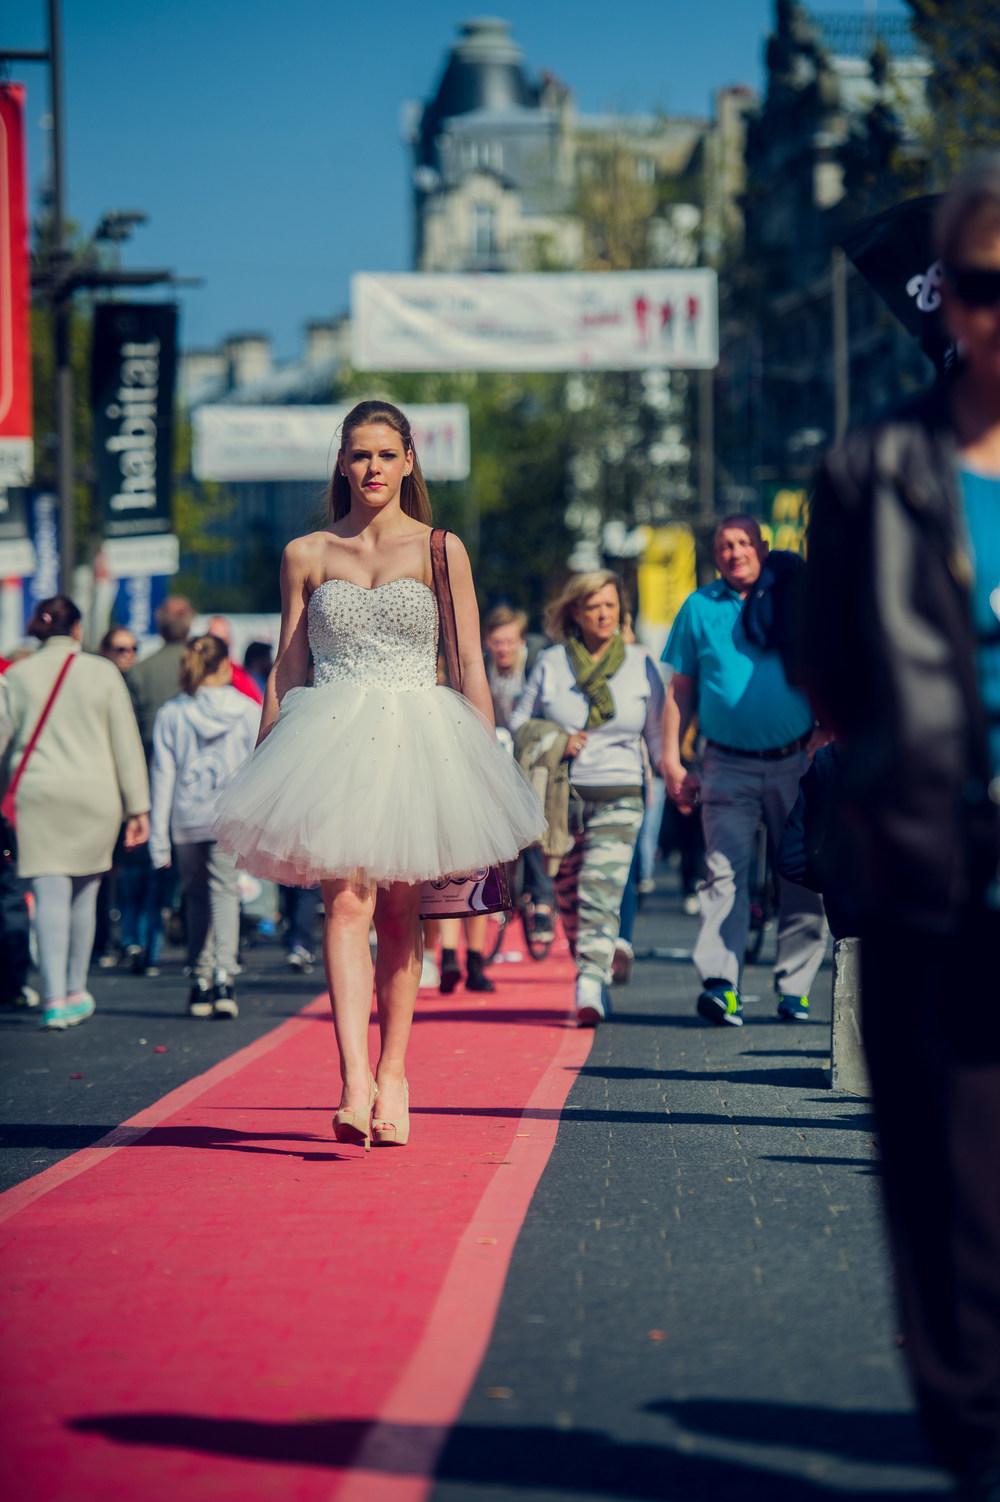 2016-05-01 - Meir Catwalk - Rode Loper @ Antwerpen - 059.jpg